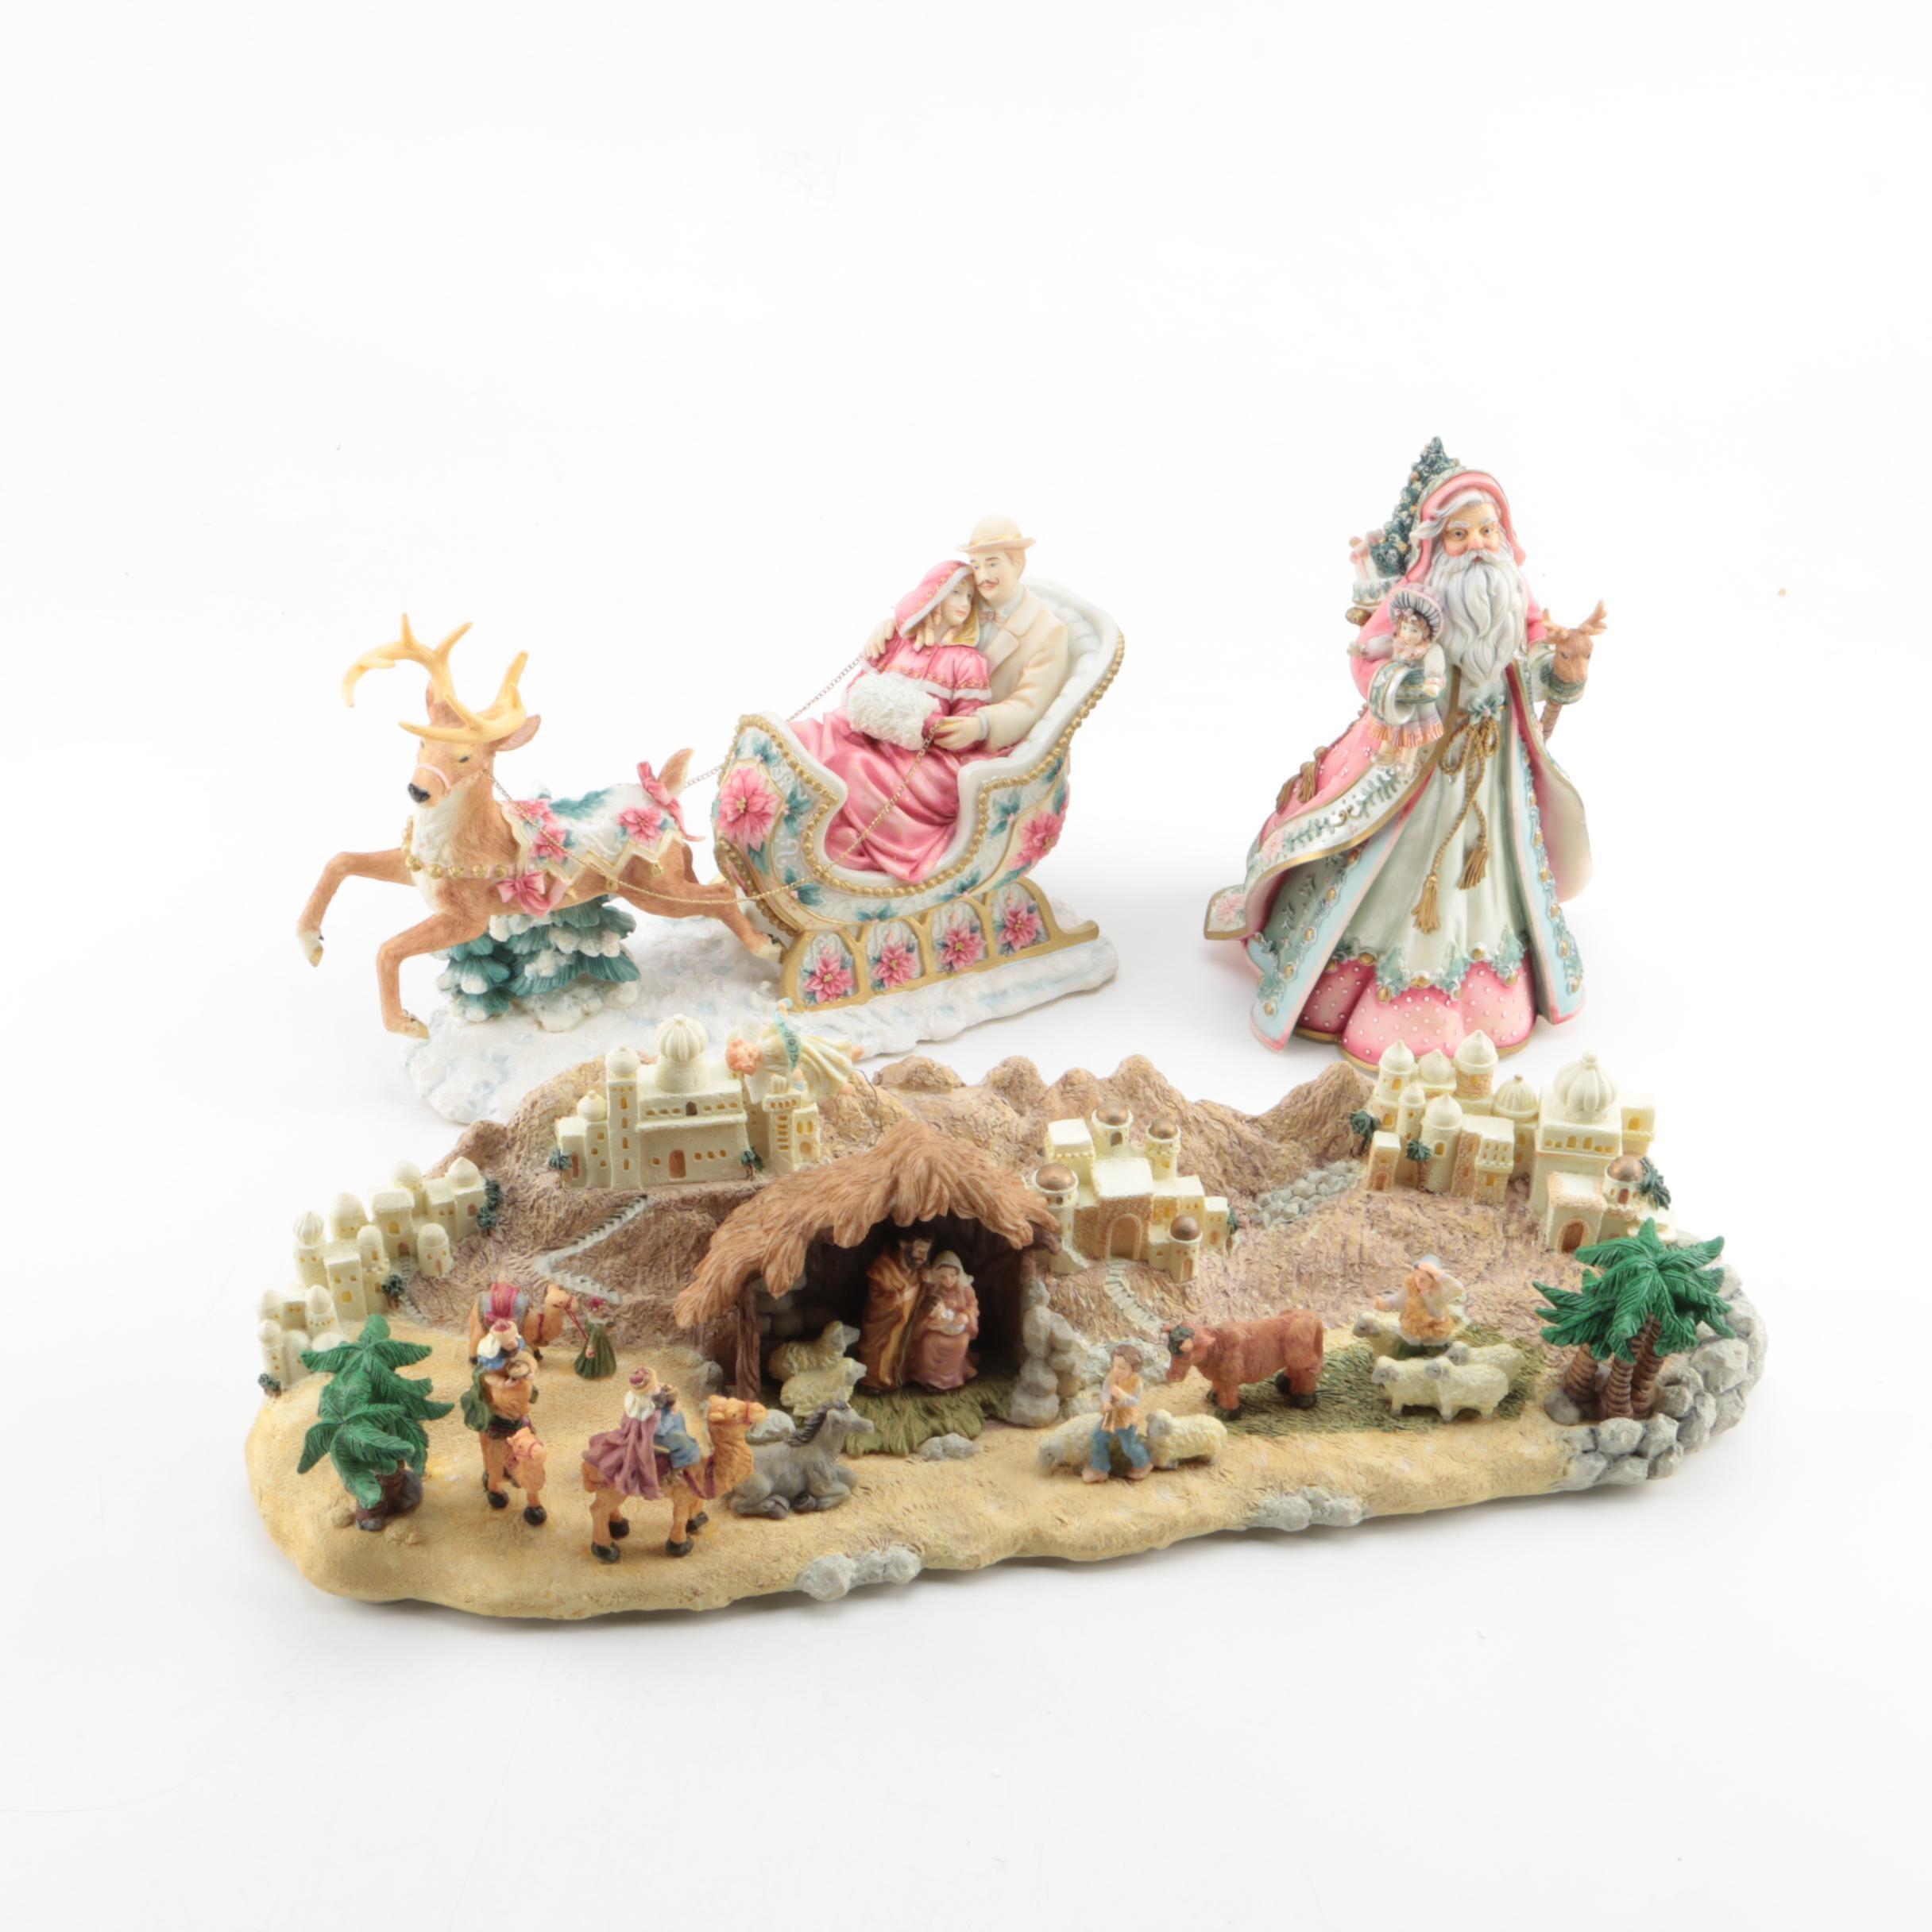 Musical Christmas Decor by San Francisco Music Box Co.